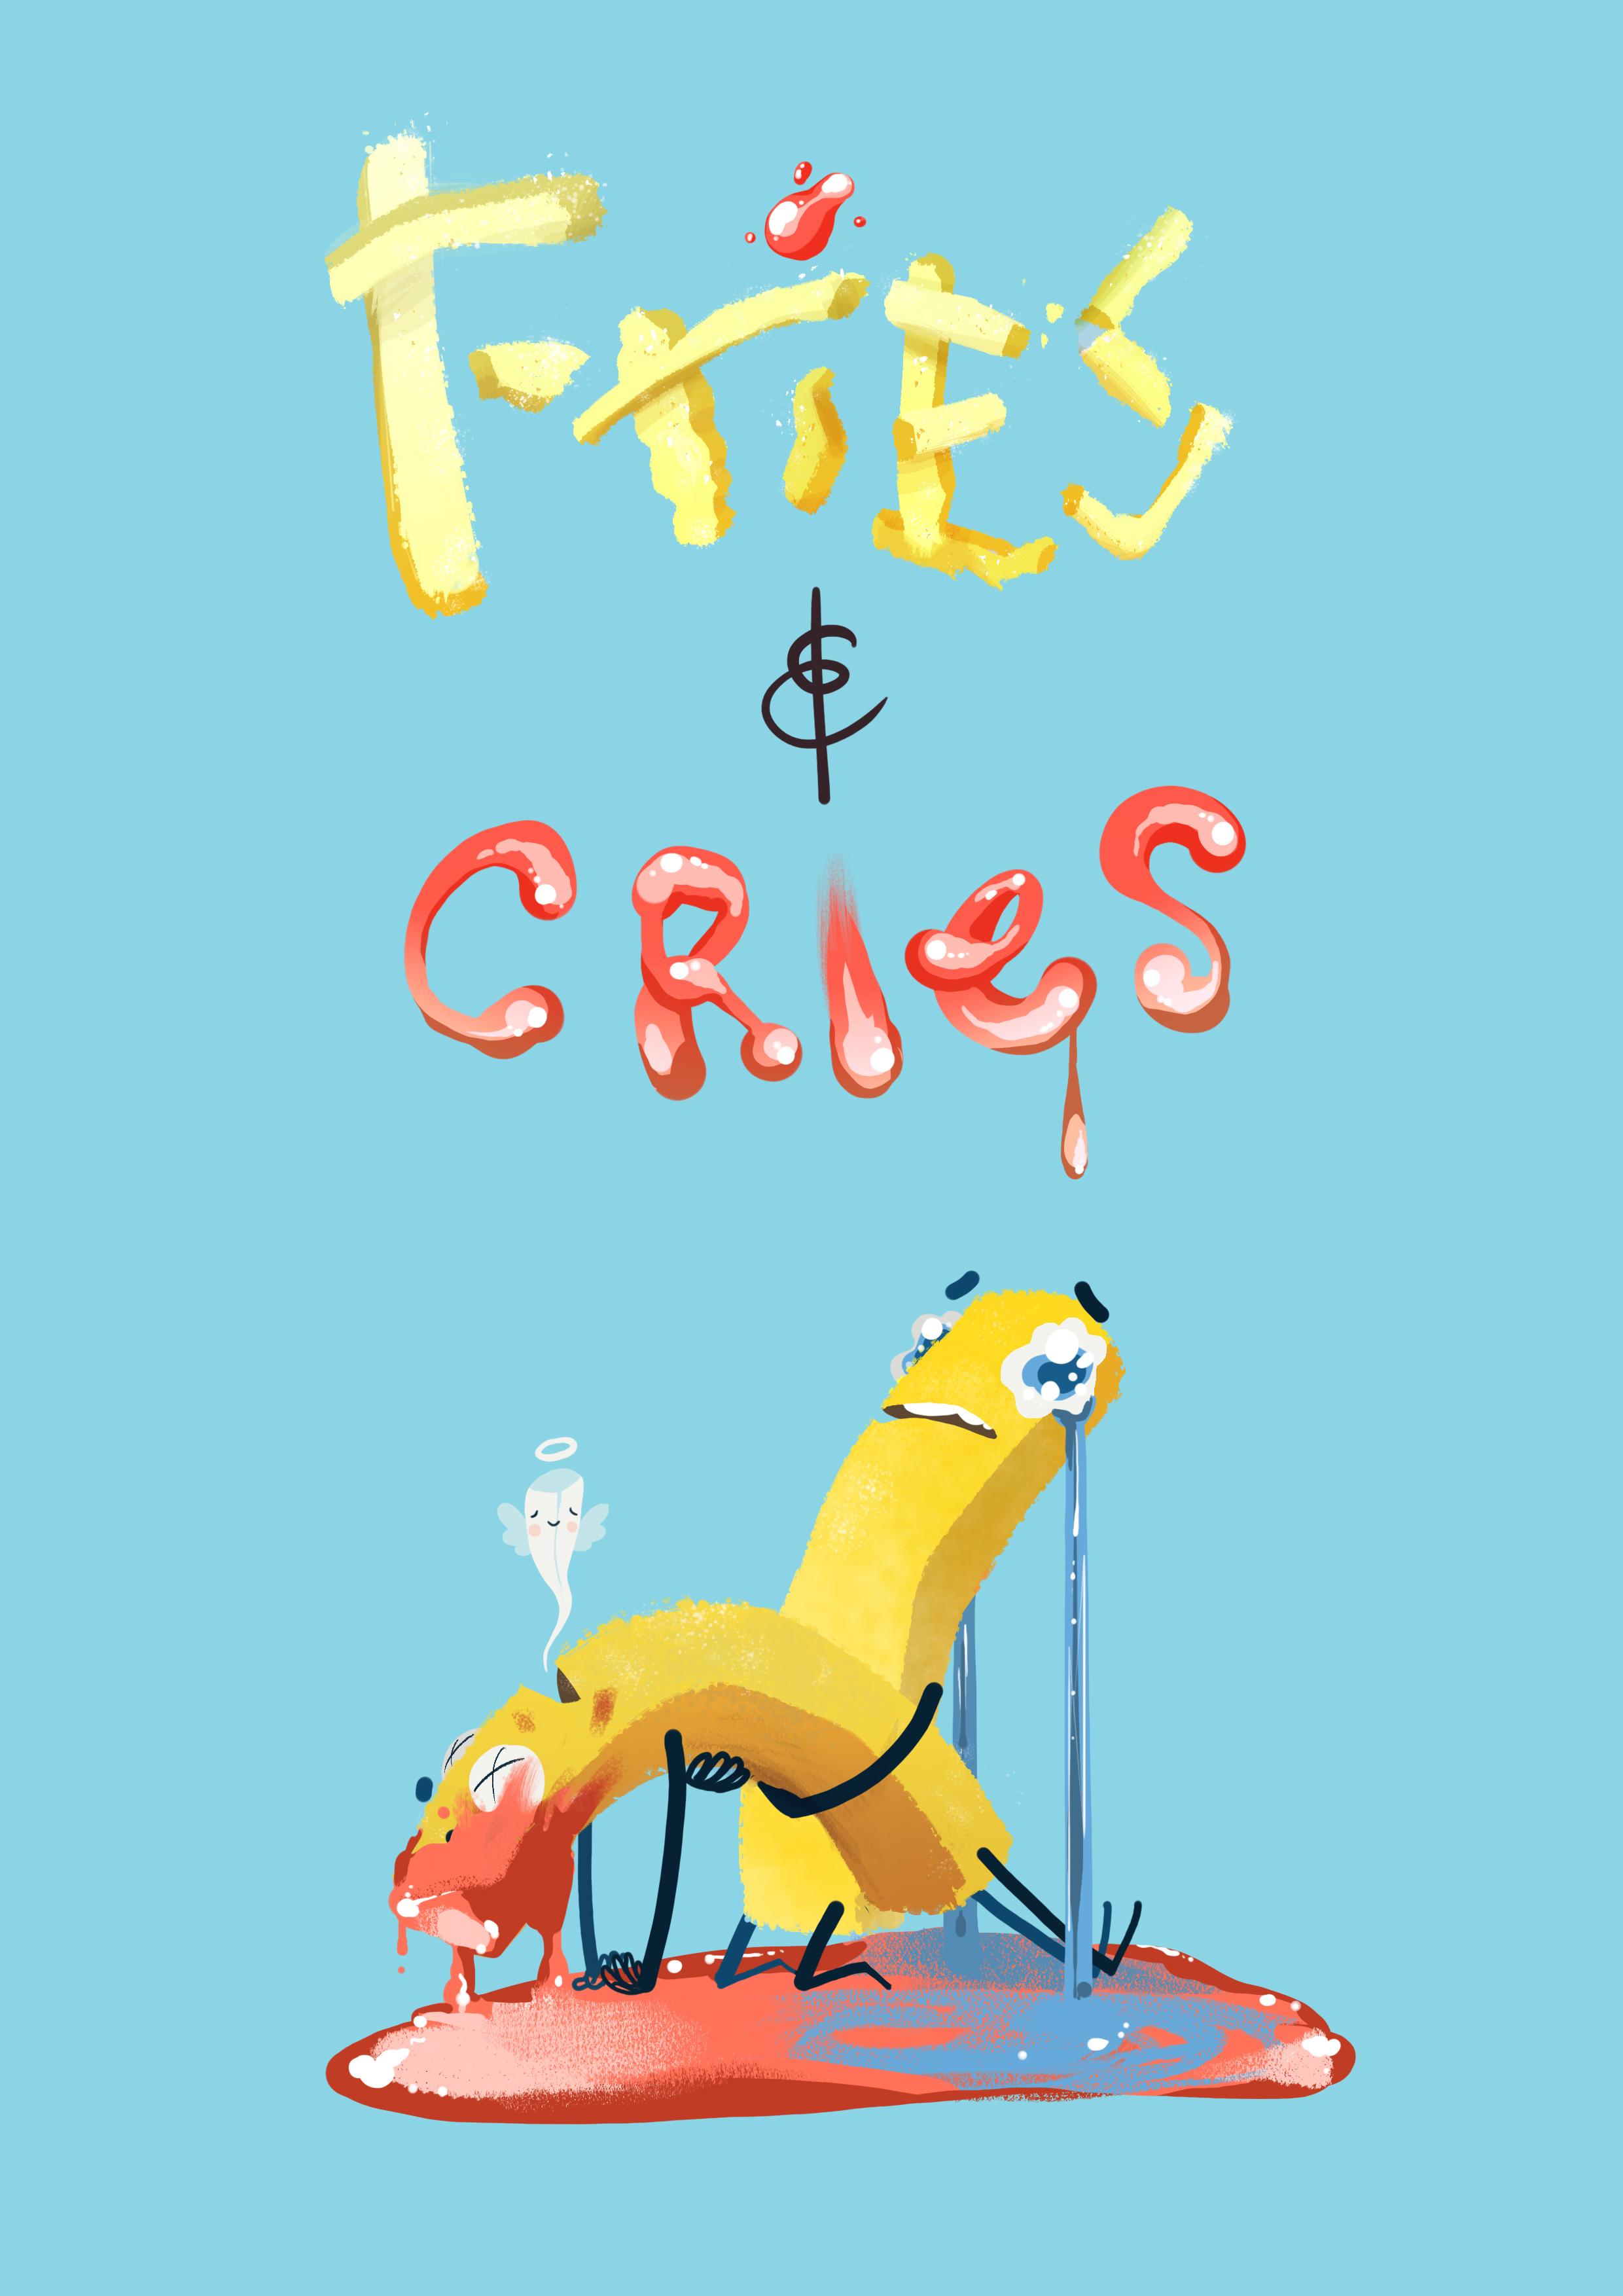 Channel Logo & Avatar Fries & Cries